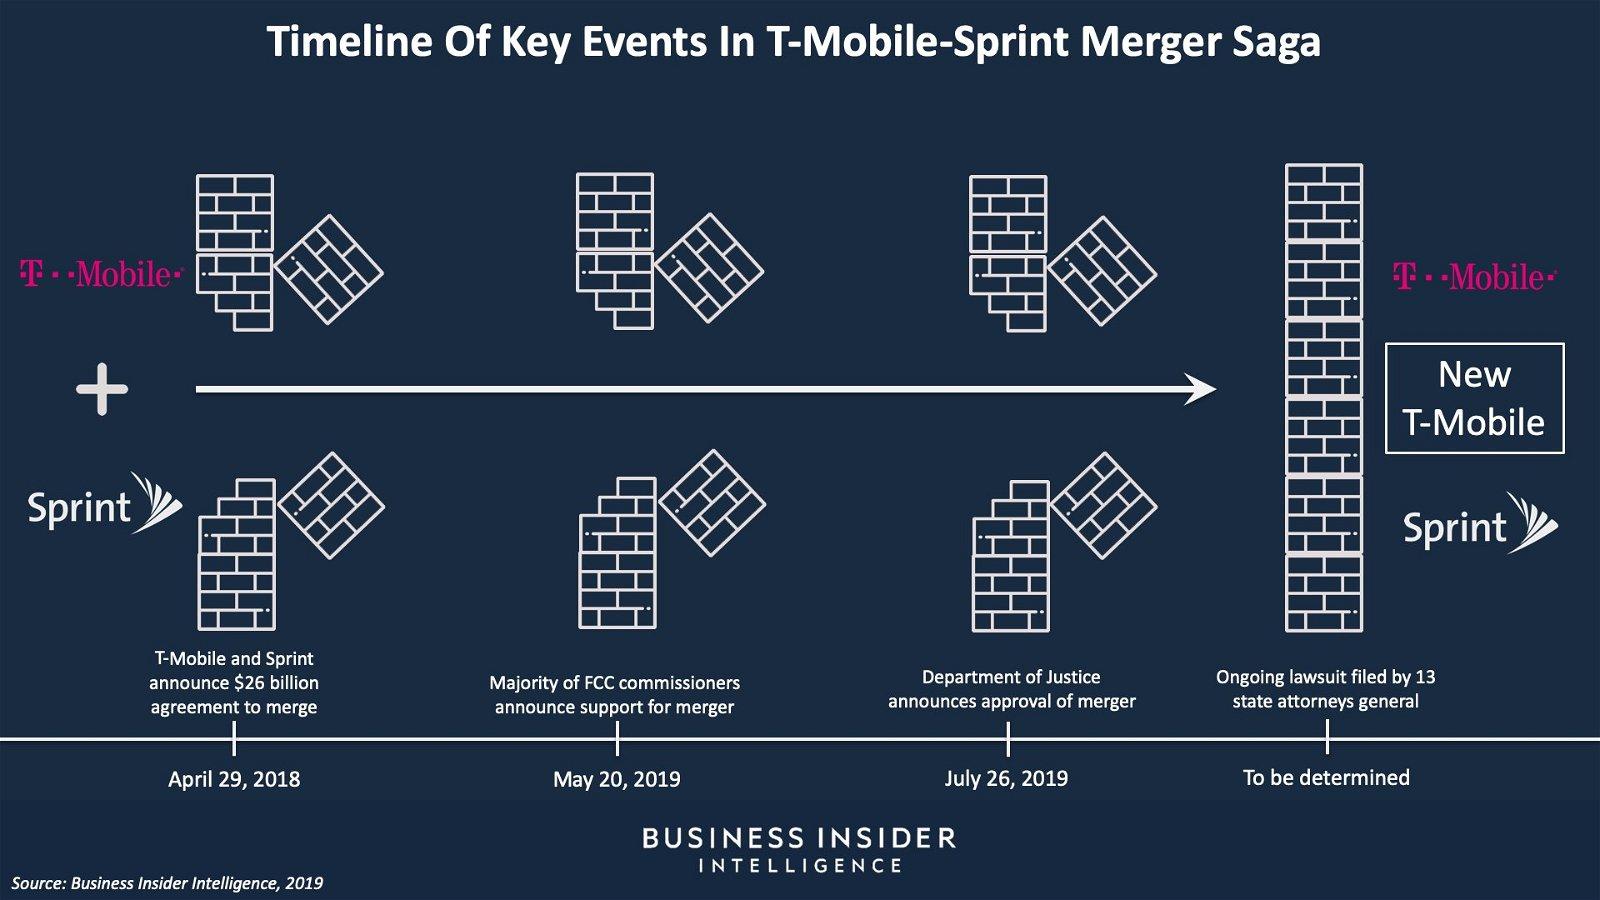 Merger delays hurt T-Mobile's 5G momentum